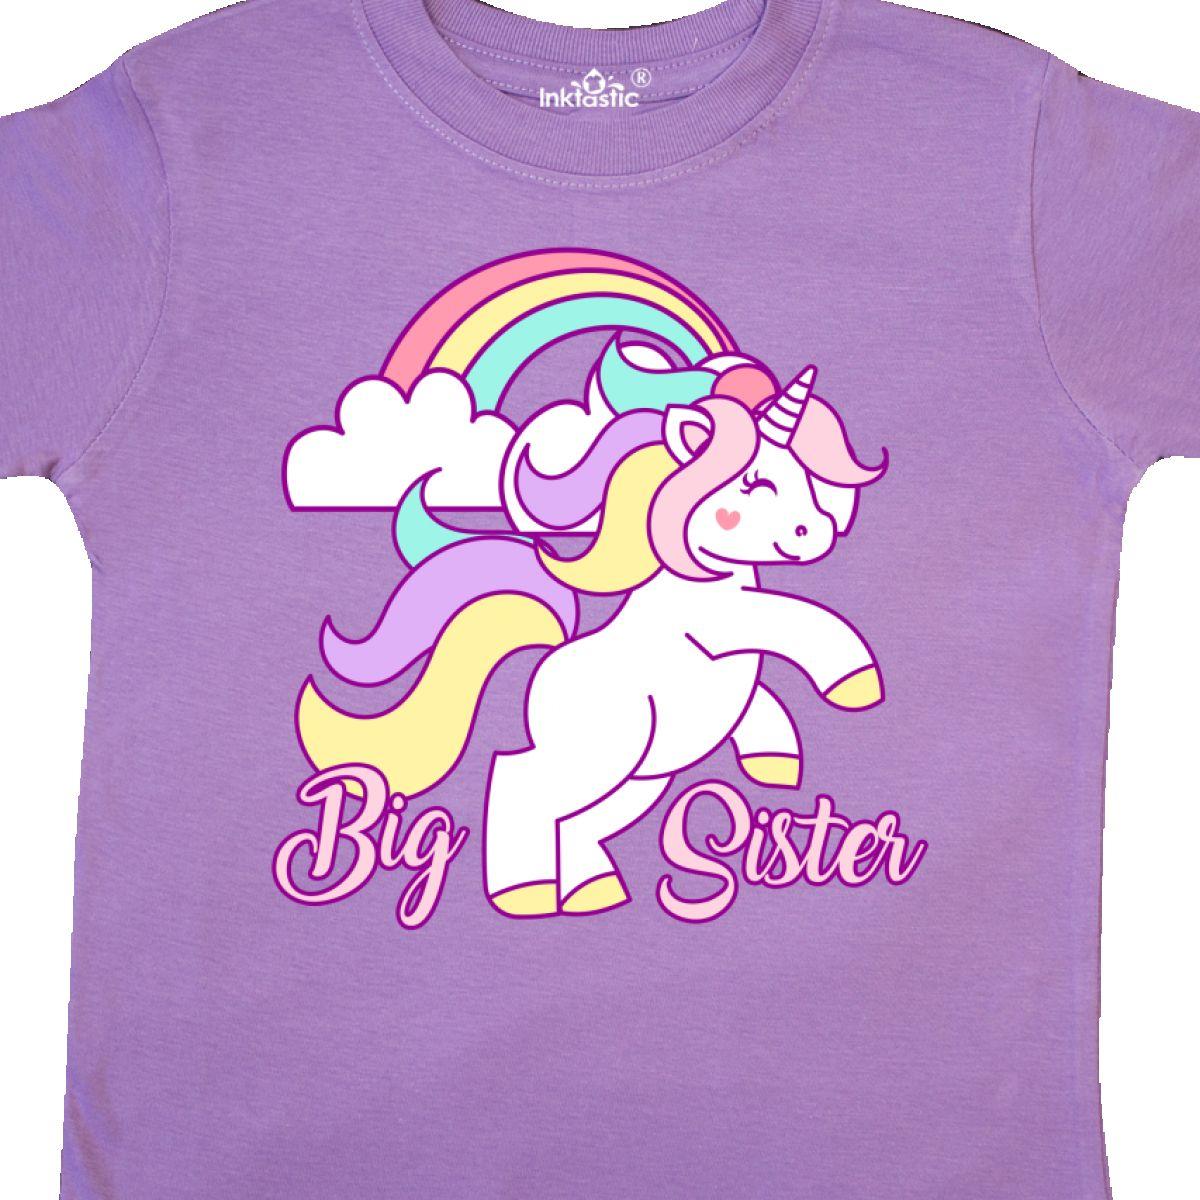 Inktastic-Big-Sister-Unicorn-Toddler-T-Shirt-Fantasy-Happy-Child-Preschooler-Kid thumbnail 6